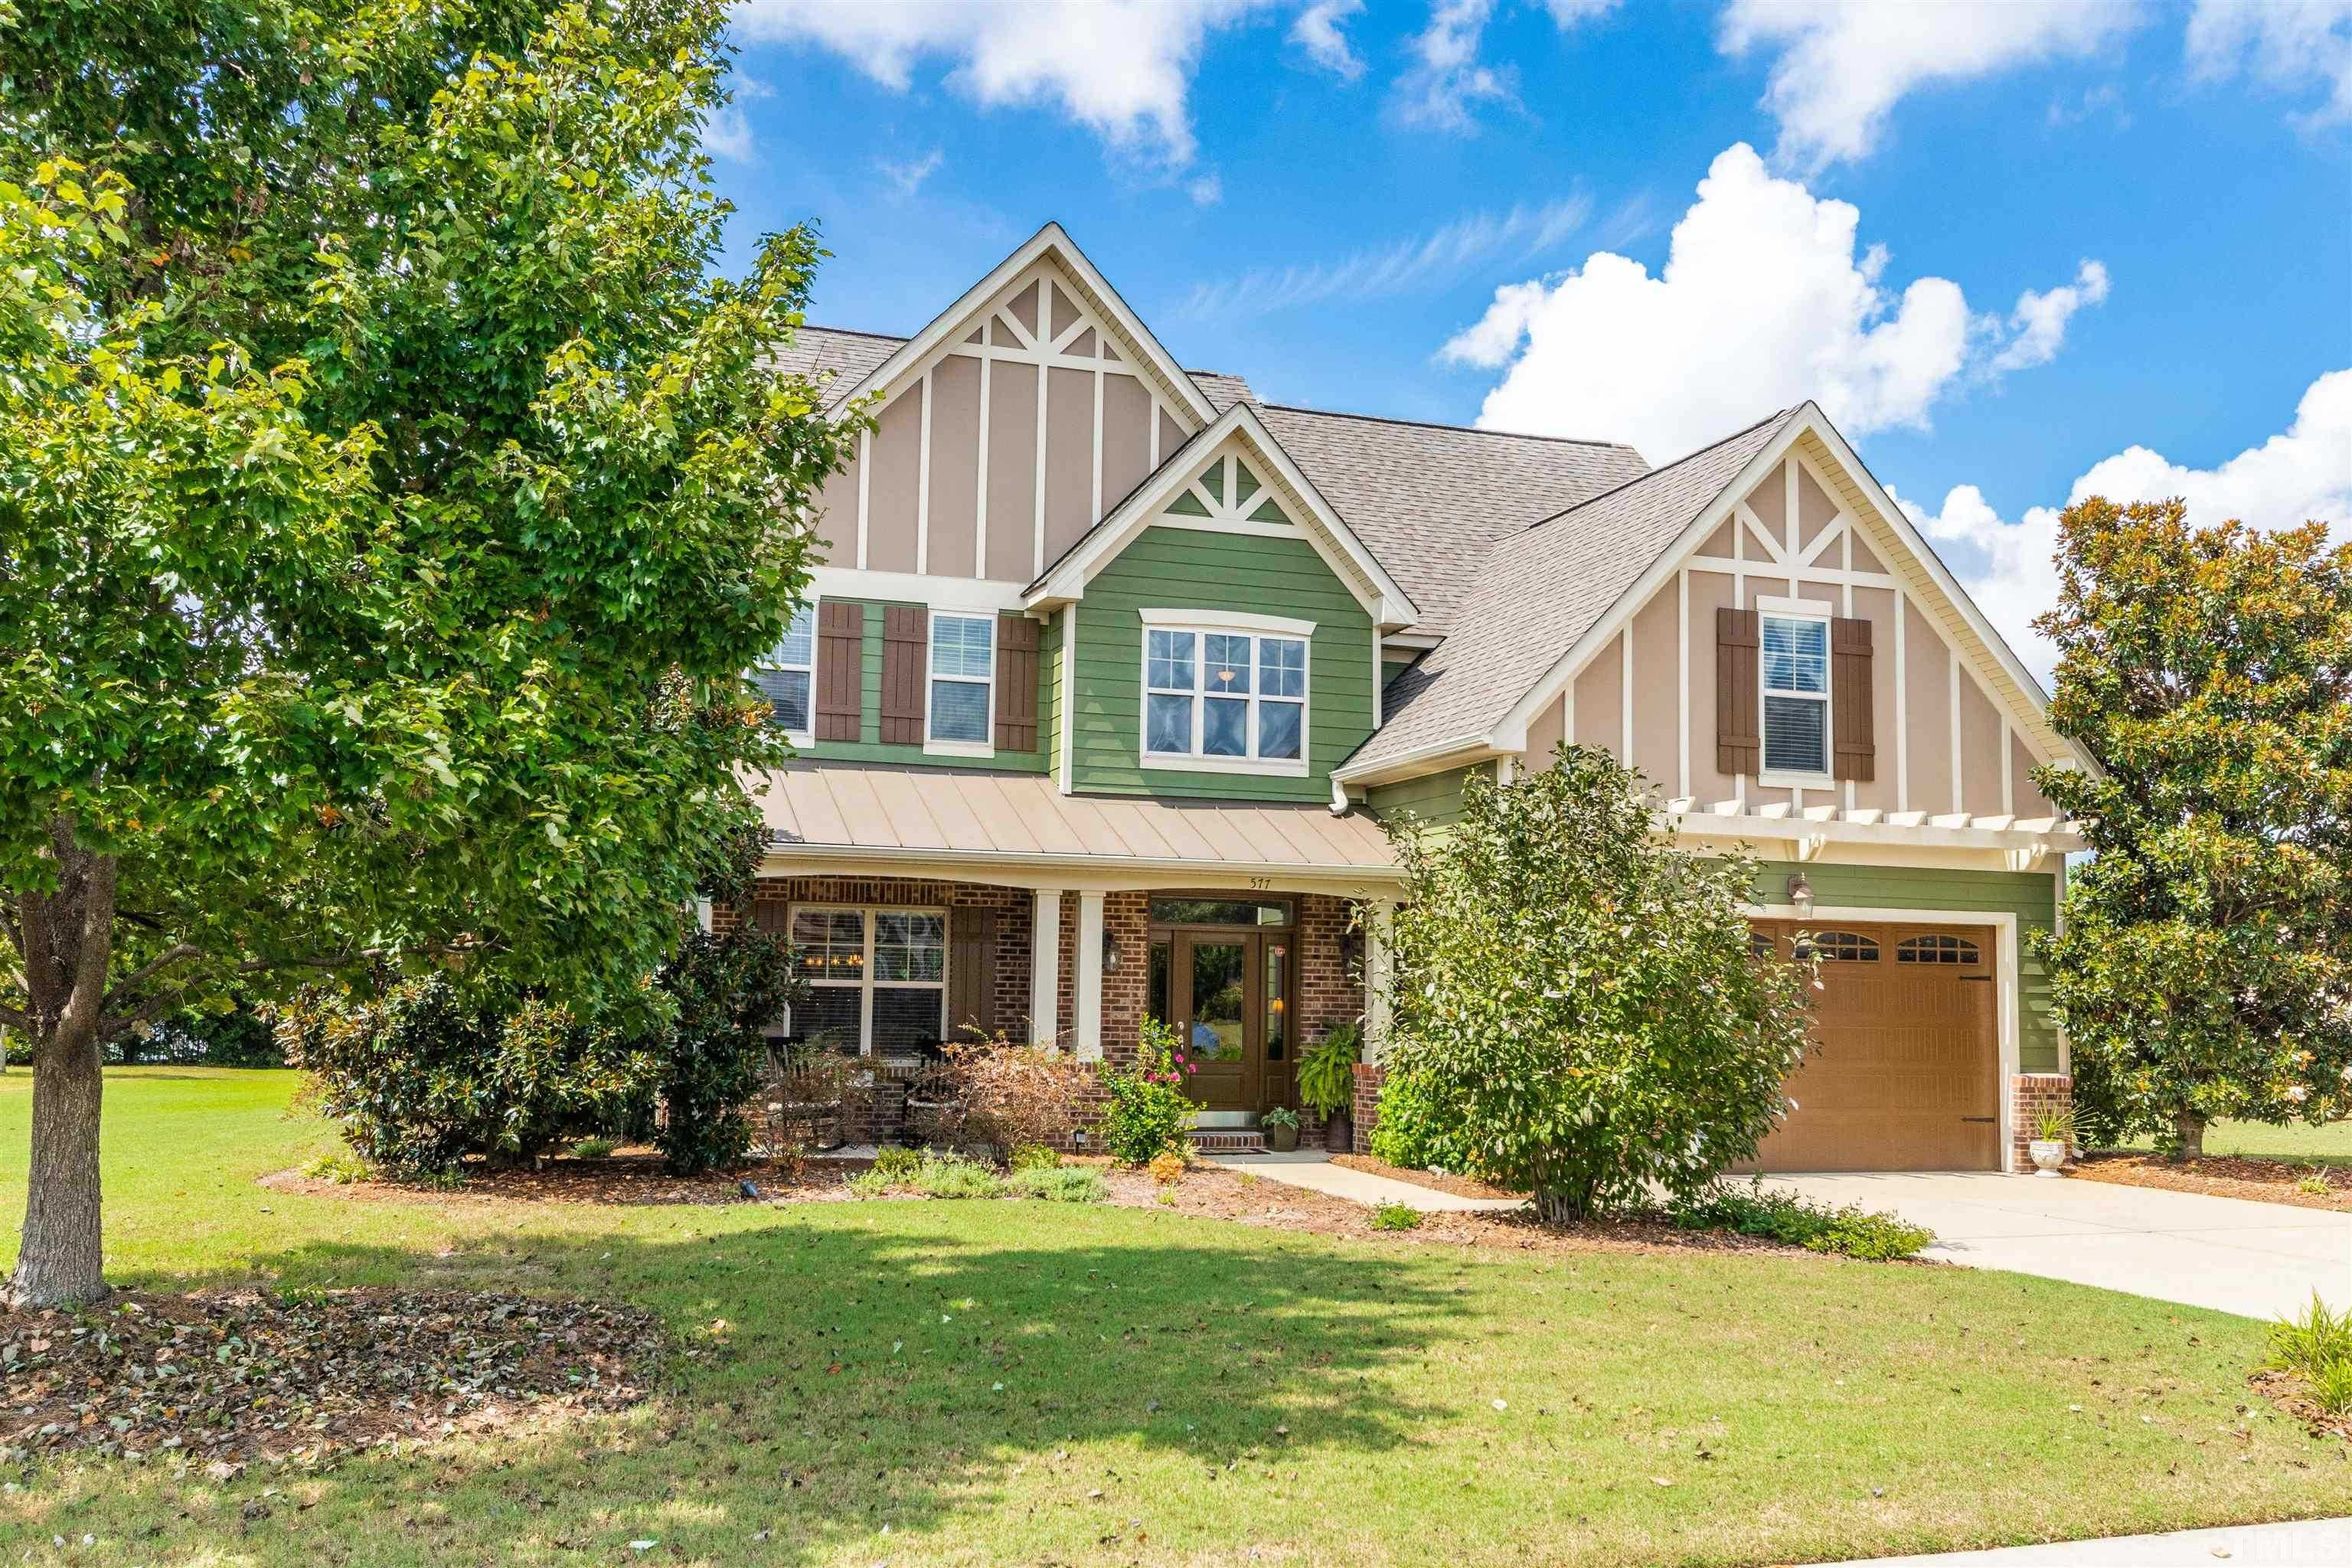 $450,000 - 4Br/3Ba -  for Sale in Adams Point, Garner